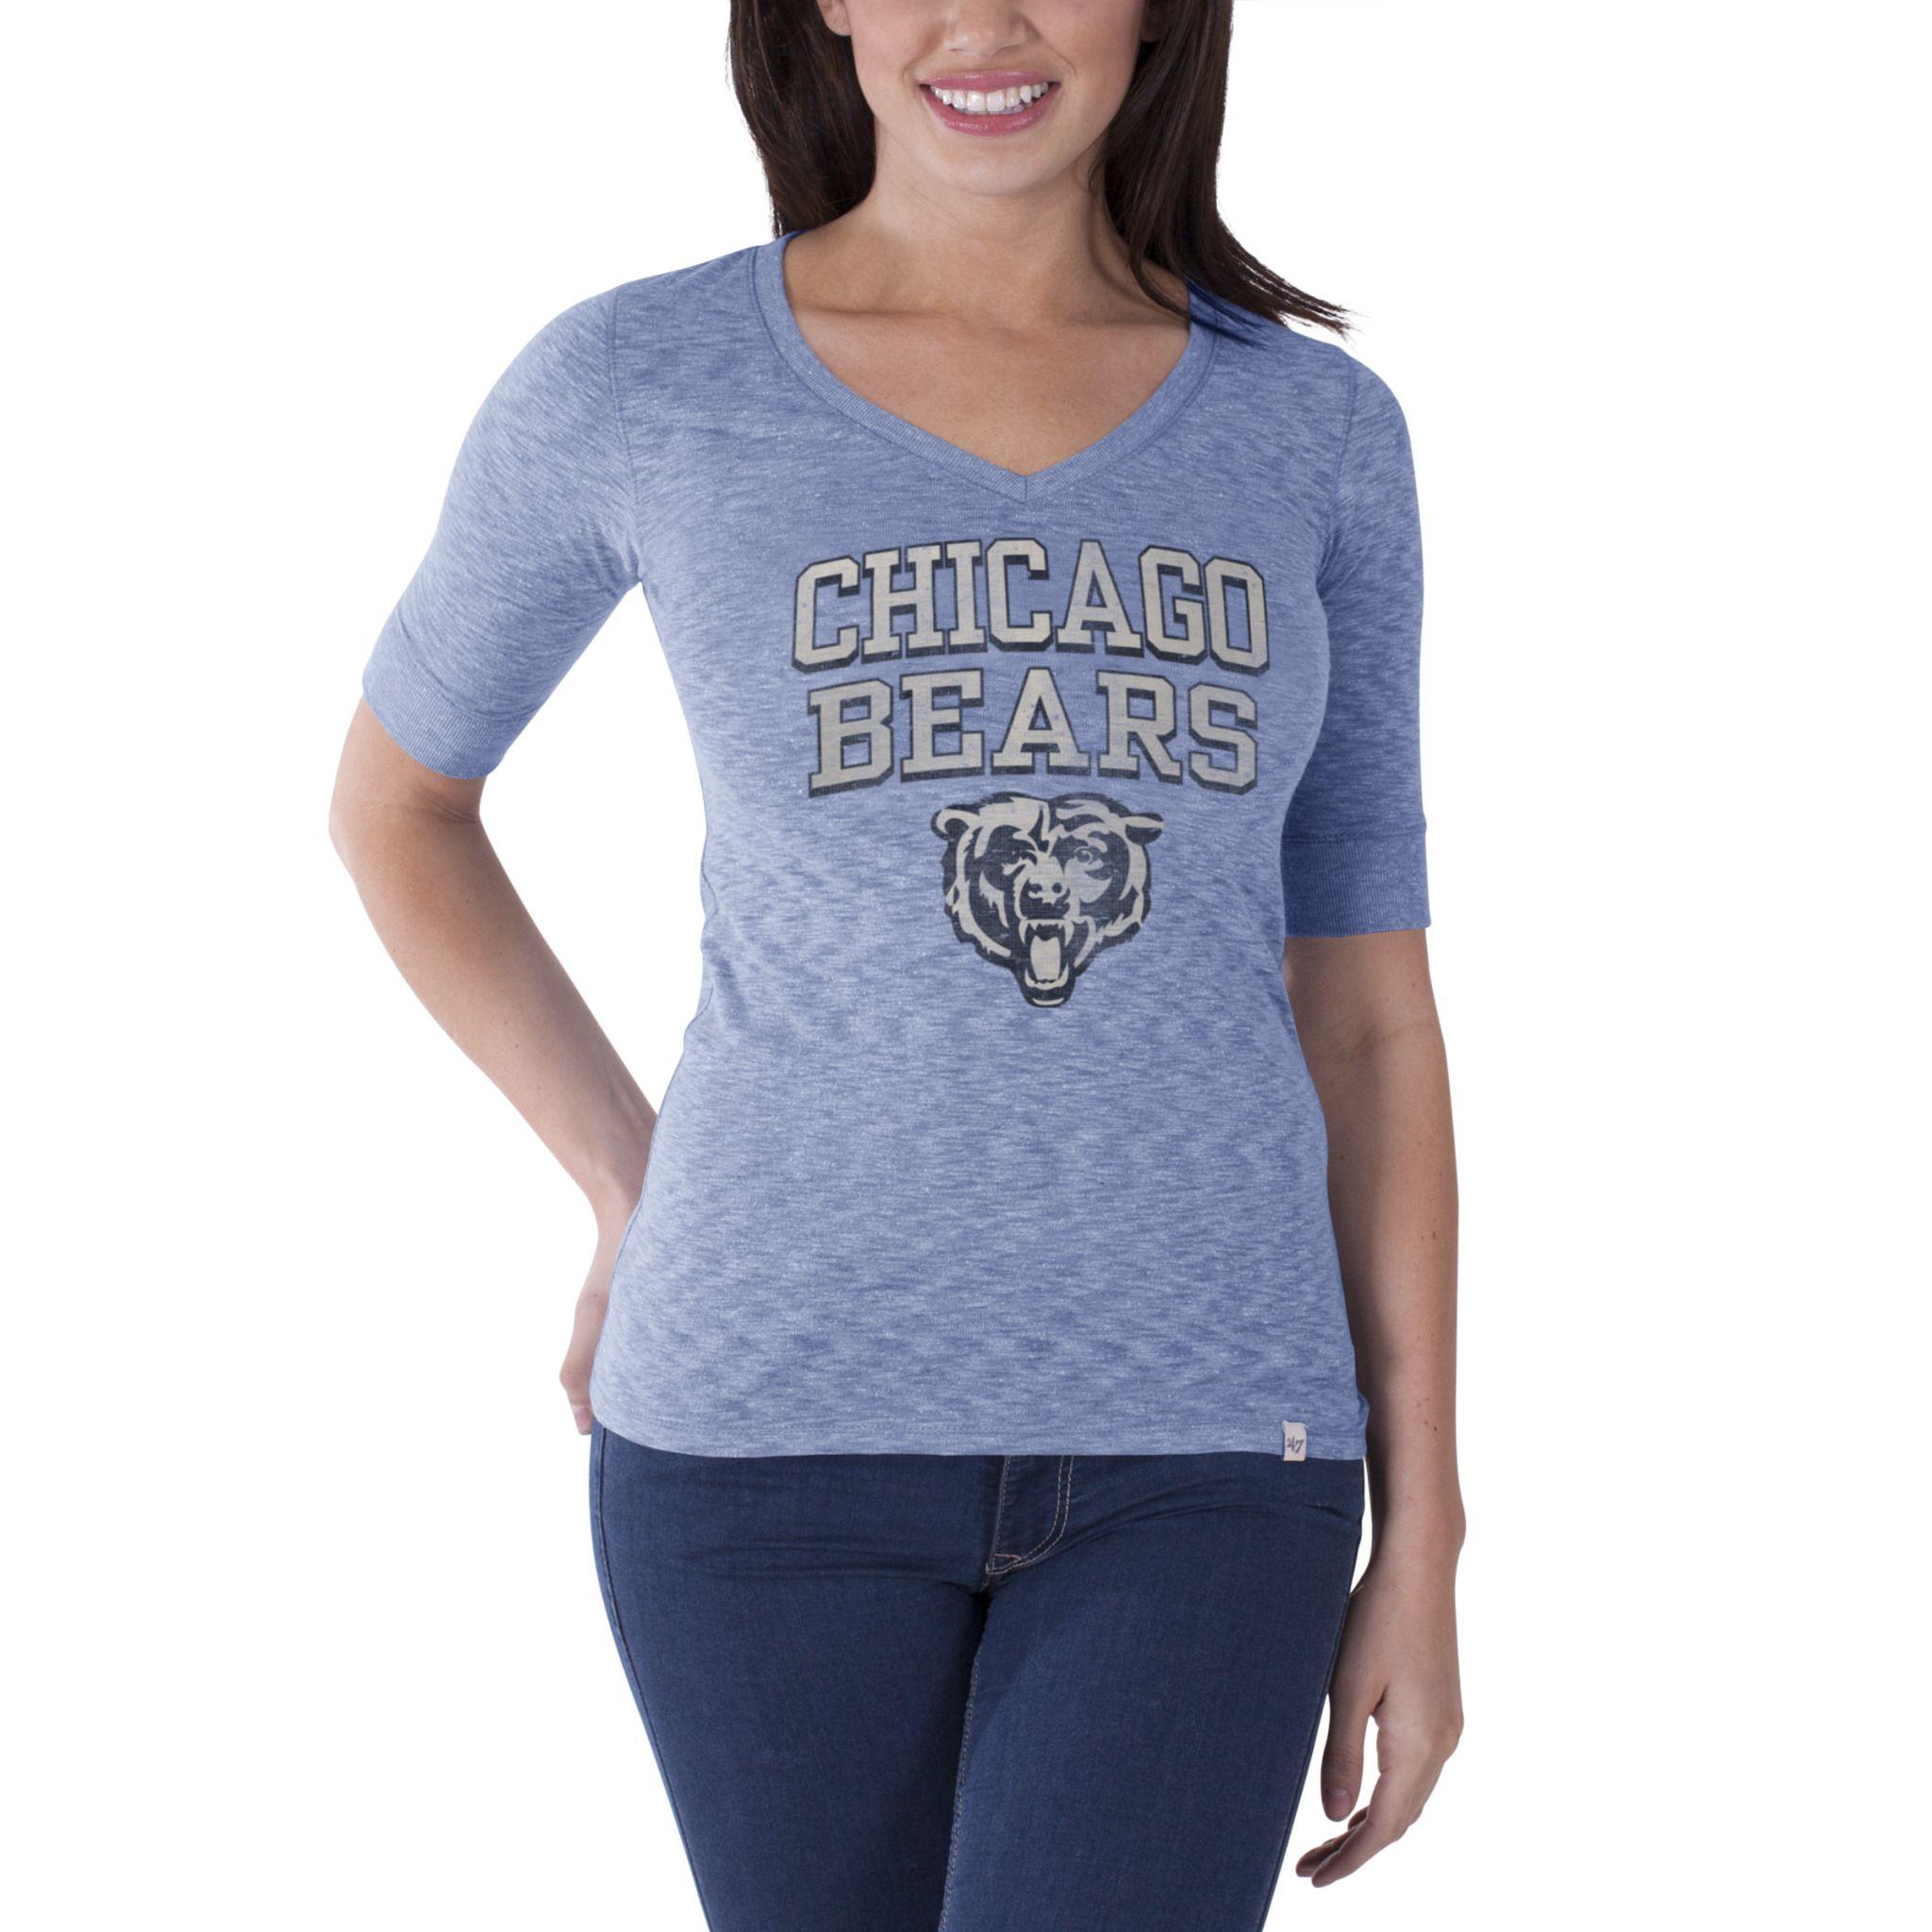 Chicago Bears Olympic Blue Women's Roster T-Shirt